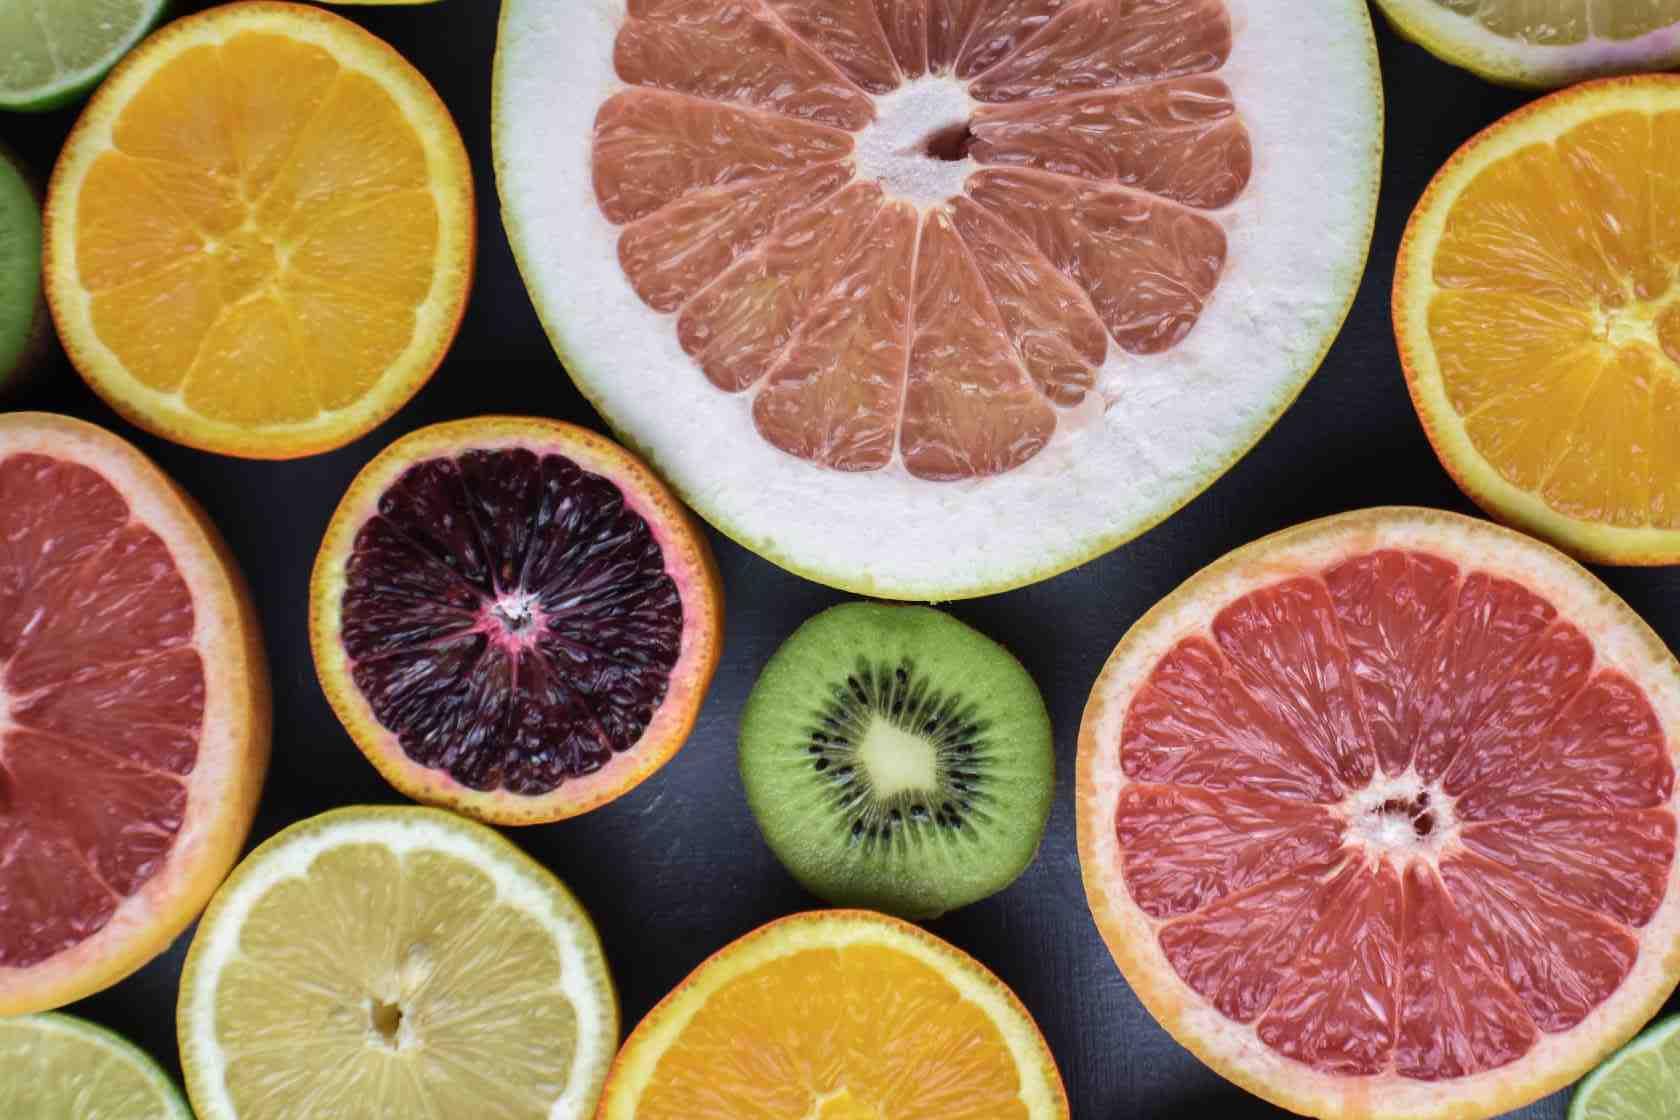 Naranjas con alto contenido en pectina cortadas en rodajas